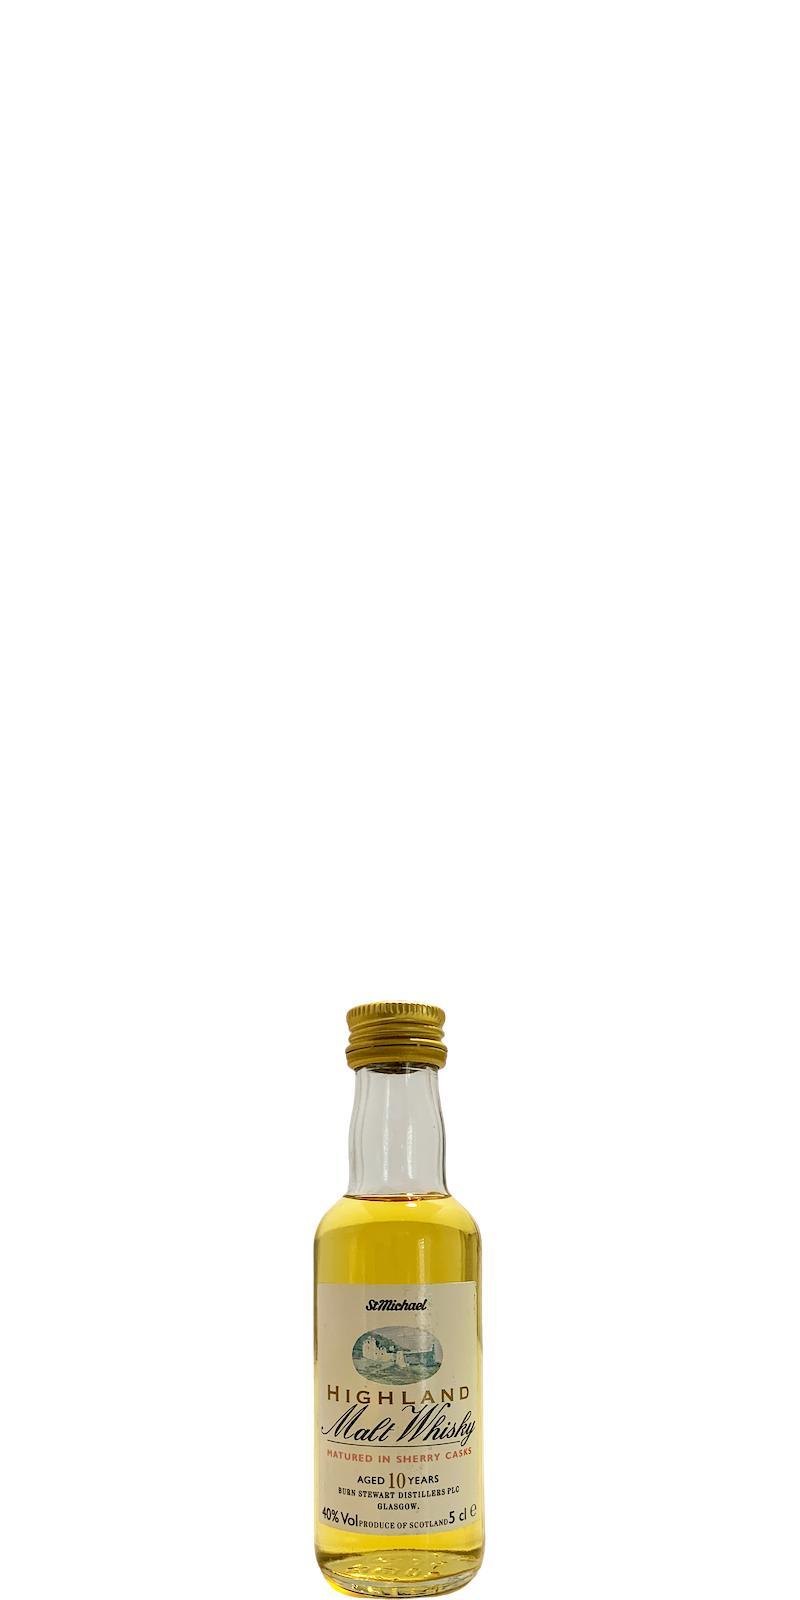 Highland Malt Whisky 10-year-old